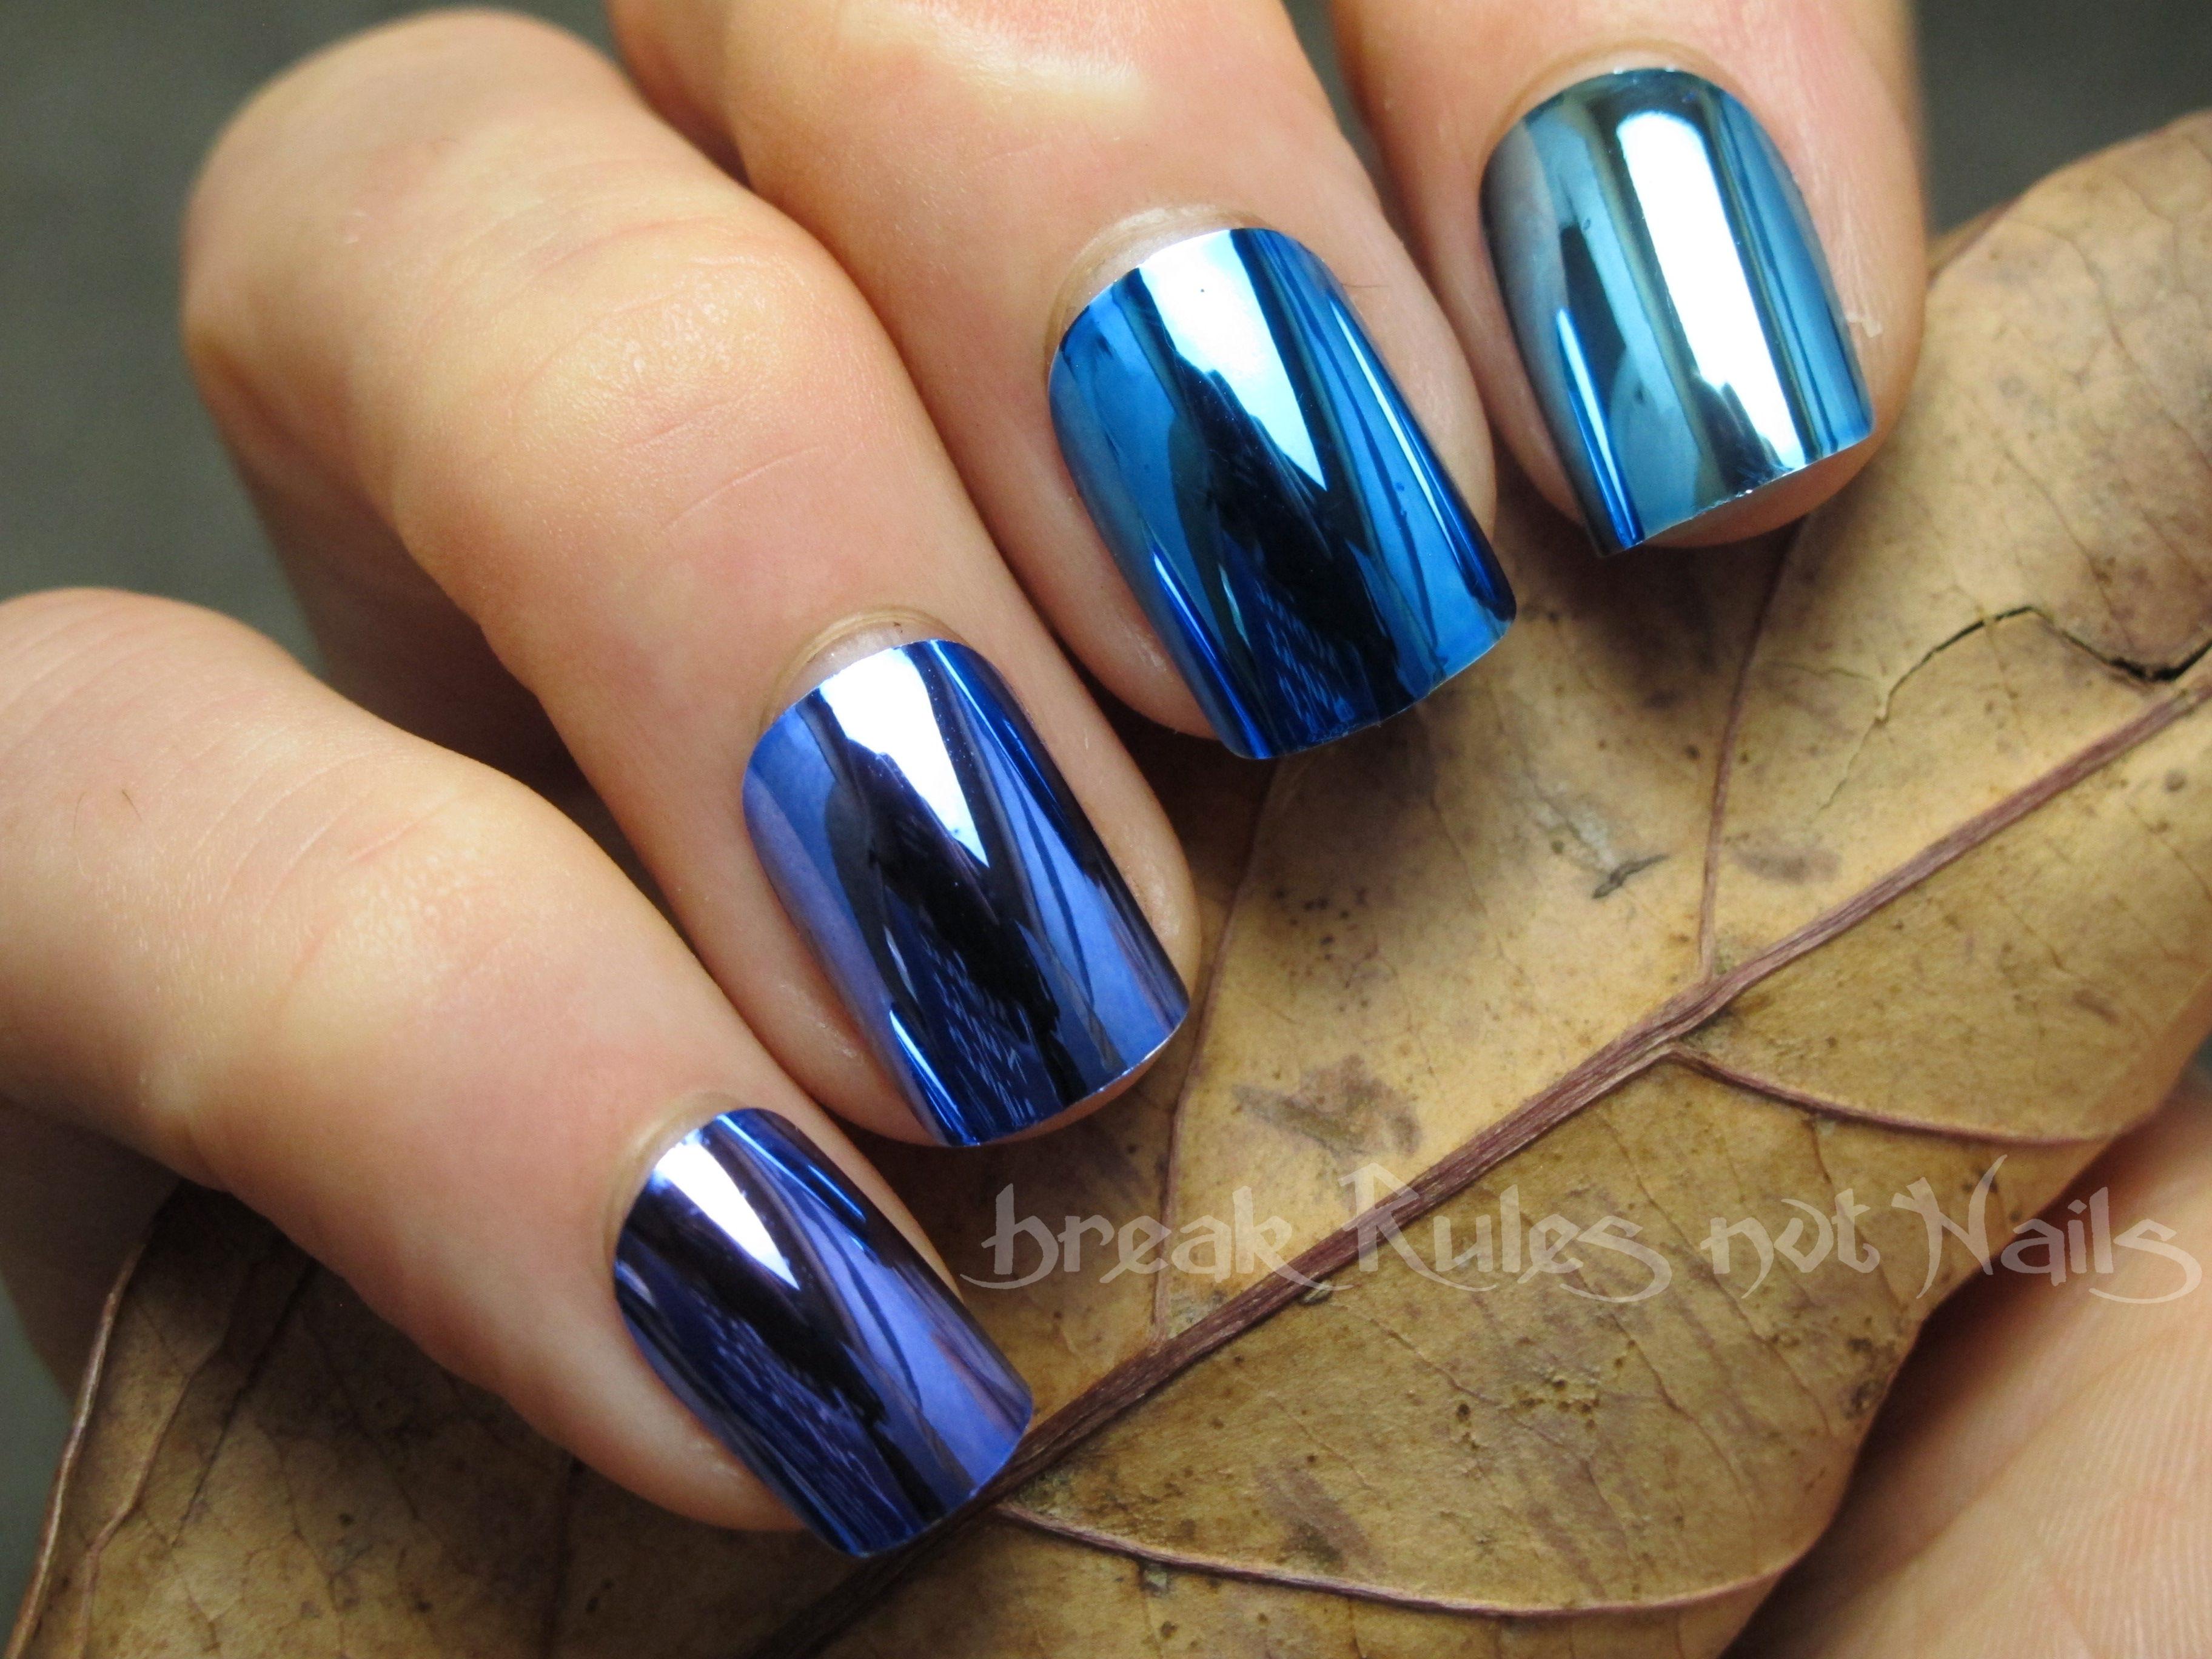 Blue chrome ombre nails | Break rules, not nails